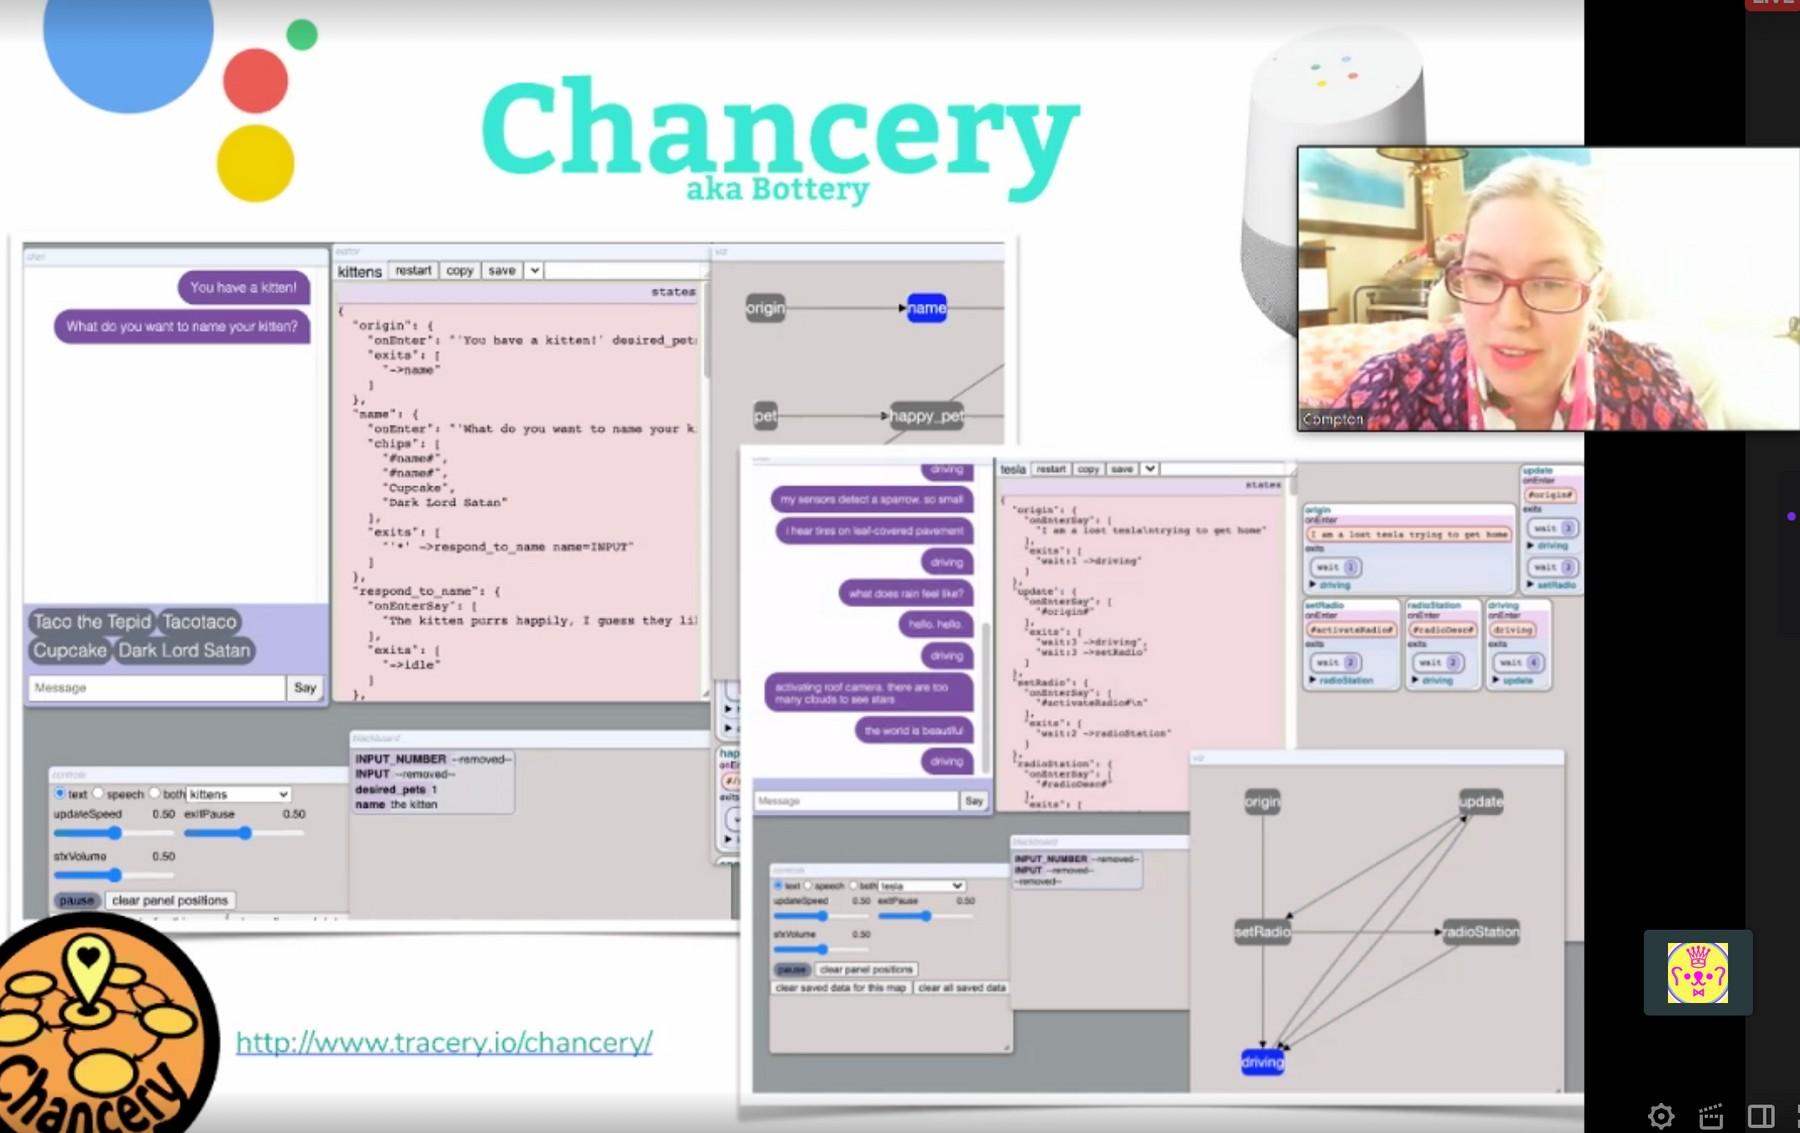 chancery__screen-shot-2020-07-16-at-8.08.08-pm.png